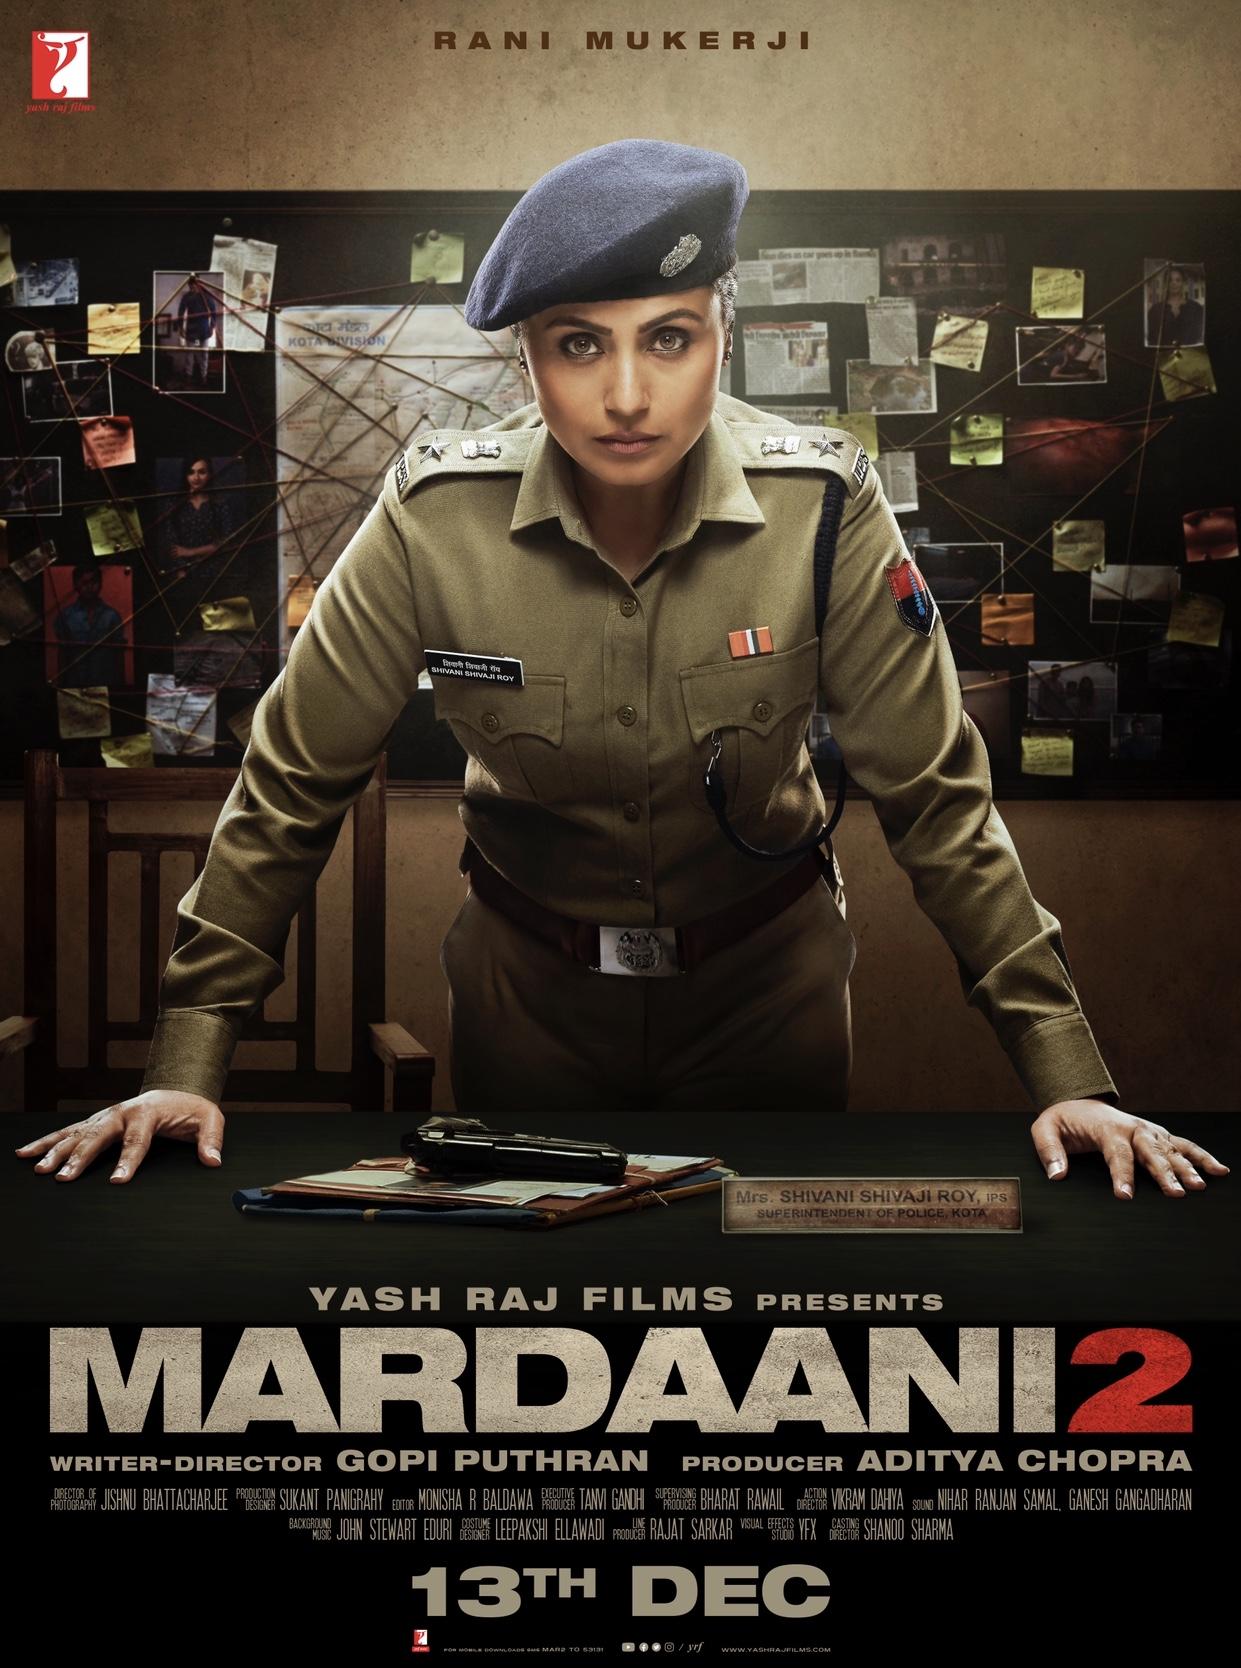 Mardaani 2 (2019) Hindi Amazon WEB-DL - 480P | 720P | 1080P - x264 - 400MB | 1GB | 2.5GB - Download & Watch Online Movie Poster - mlsbd